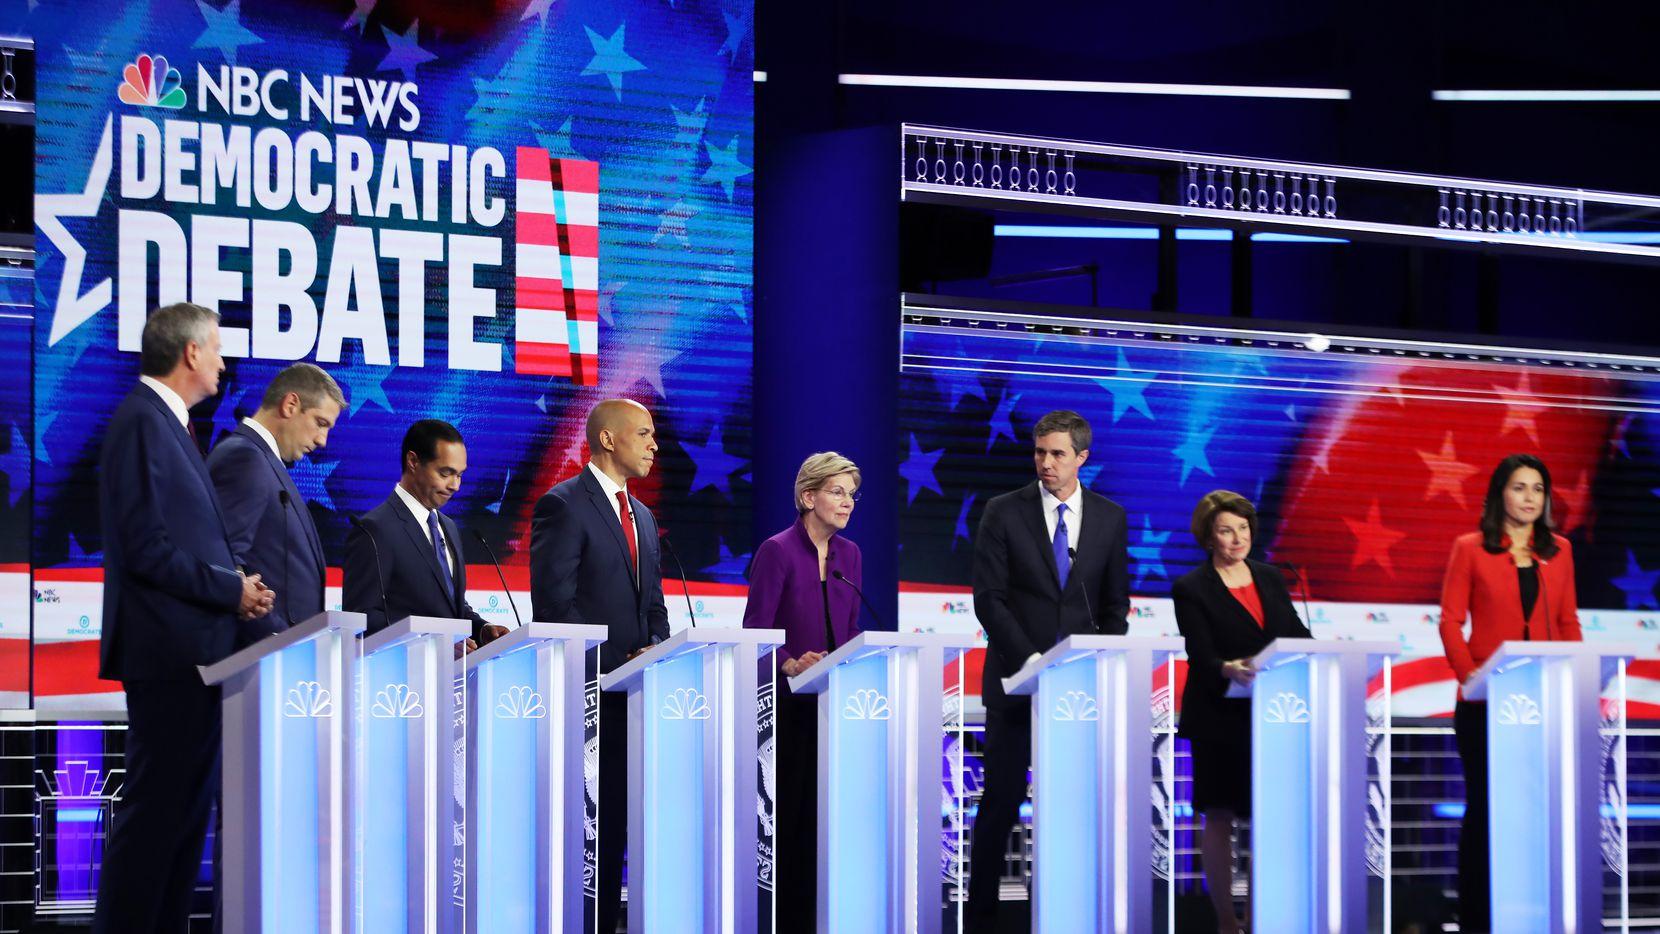 Democratic presidential candidates New York City Mayor Bill De Blasio (L-R), Rep. Tim Ryan (D-OH), former housing secretary Julian Castro, Sen. Cory Booker (D-NJ), Sen. Elizabeth Warren (D-MA), former Texas congressman Beto O'Rourke, Sen. Amy Klobuchar (D-MN) and Rep. Tulsi Gabbard (D-HI) take part in the first night of the Democratic presidential debate on June 26, 2019 in Miami, Fla.